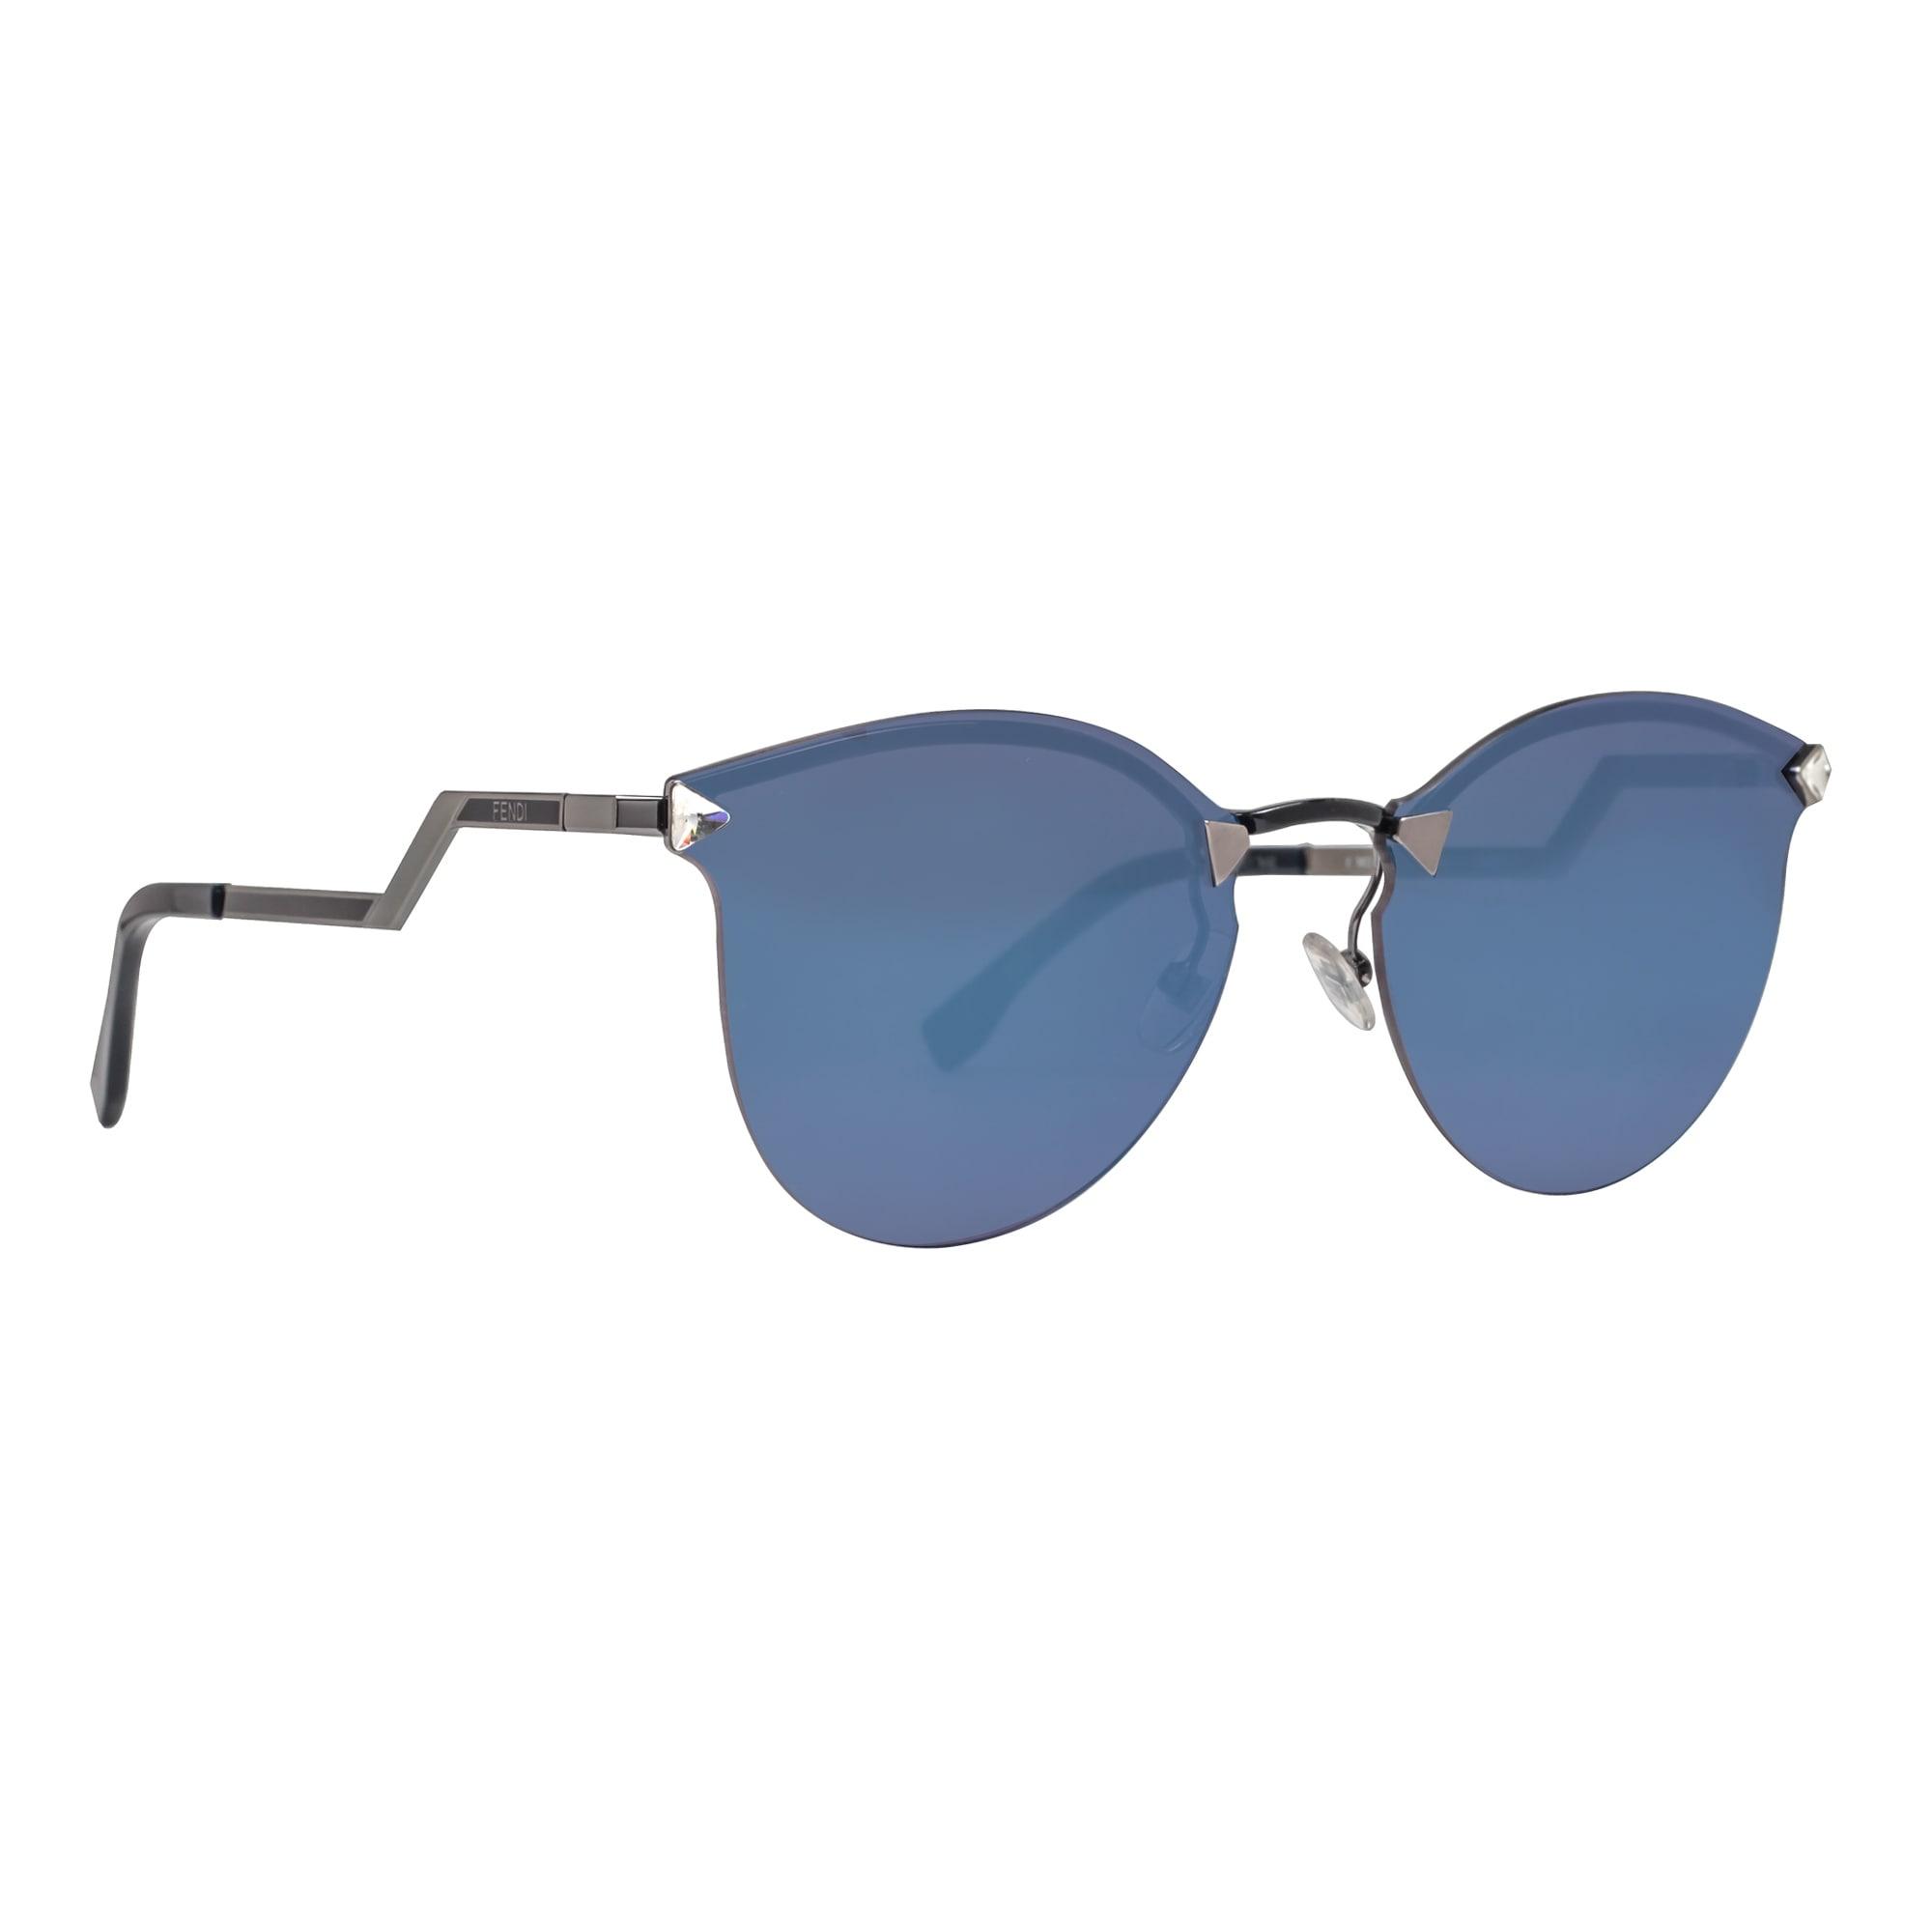 e6da19ef9b4 Shop Fendi FF 0040 S LQJ XT Rimless Black Blue Mirror Cat Eye Women s  Sunglasses - dark ruthenium   black - 60mm-17mm-135mm - Free Shipping Today  ...